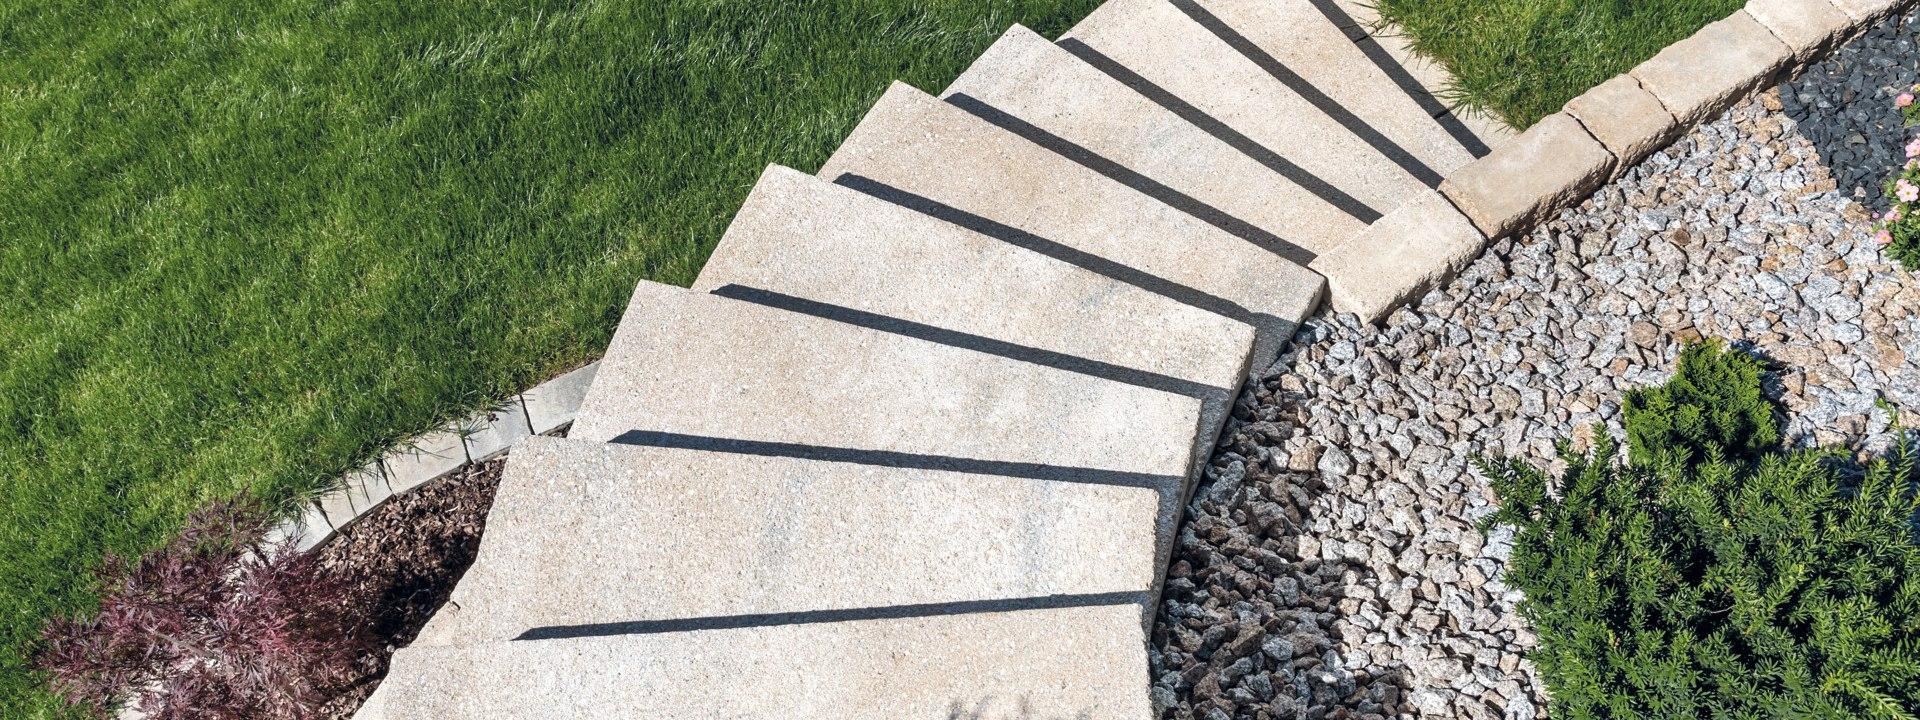 Treppenstufe Blockstufe KLASSIKLINE von GODELMANN